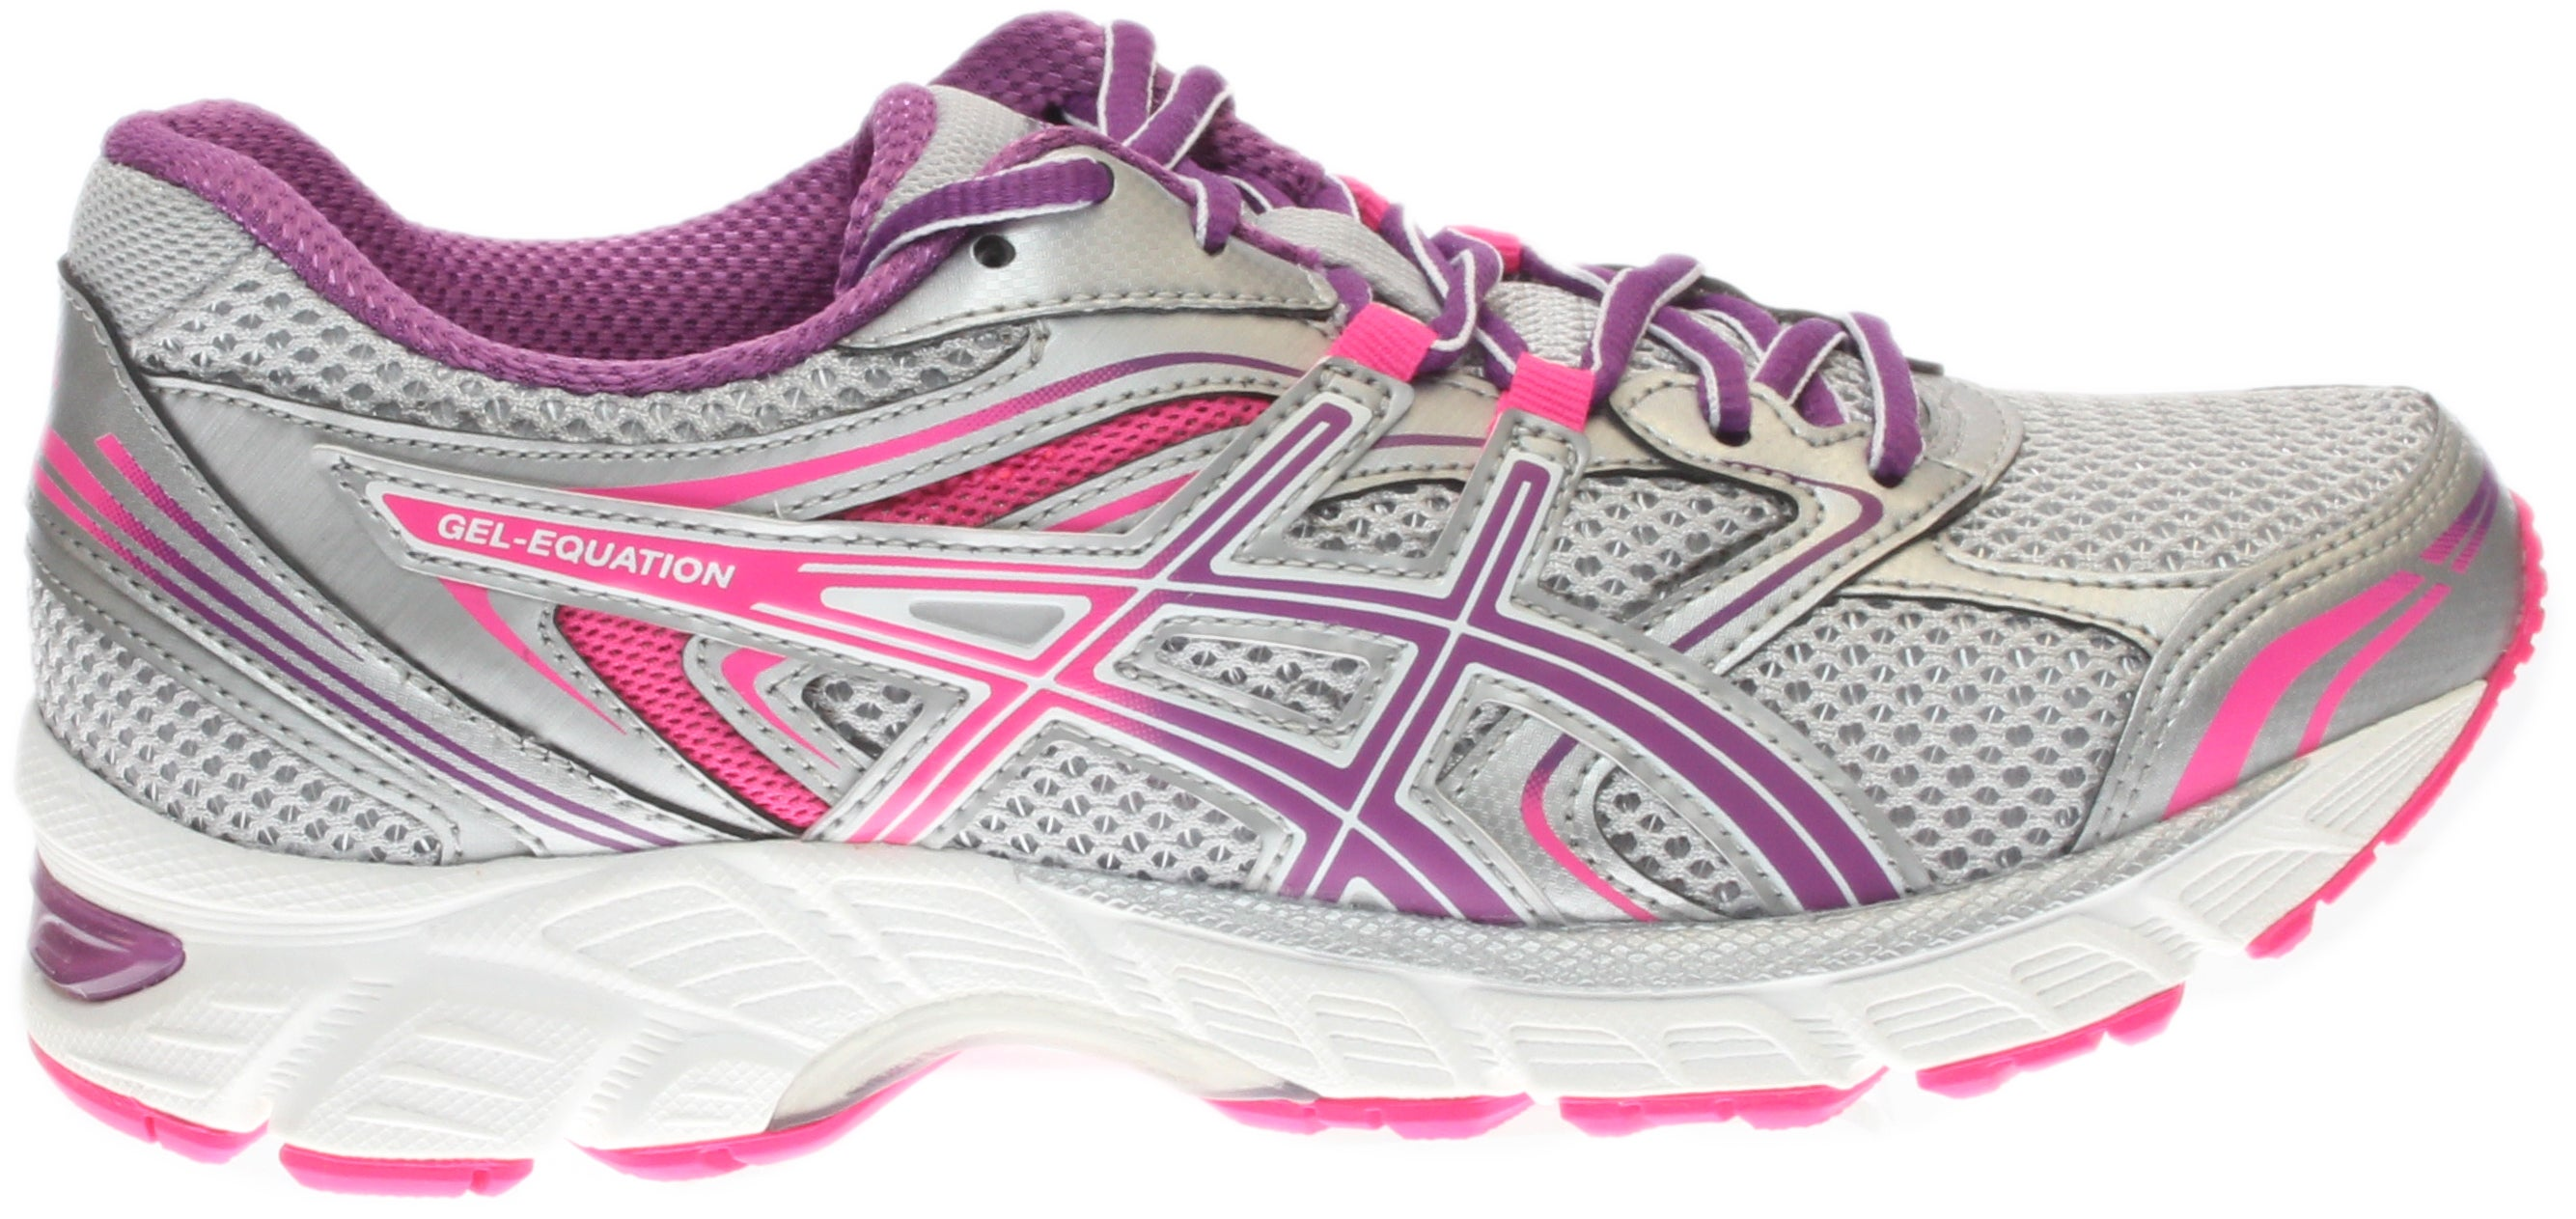 3b156bb2b0f ASICS GEL-Equation 8 Running Shoes Silver - Womens - Size 5 D